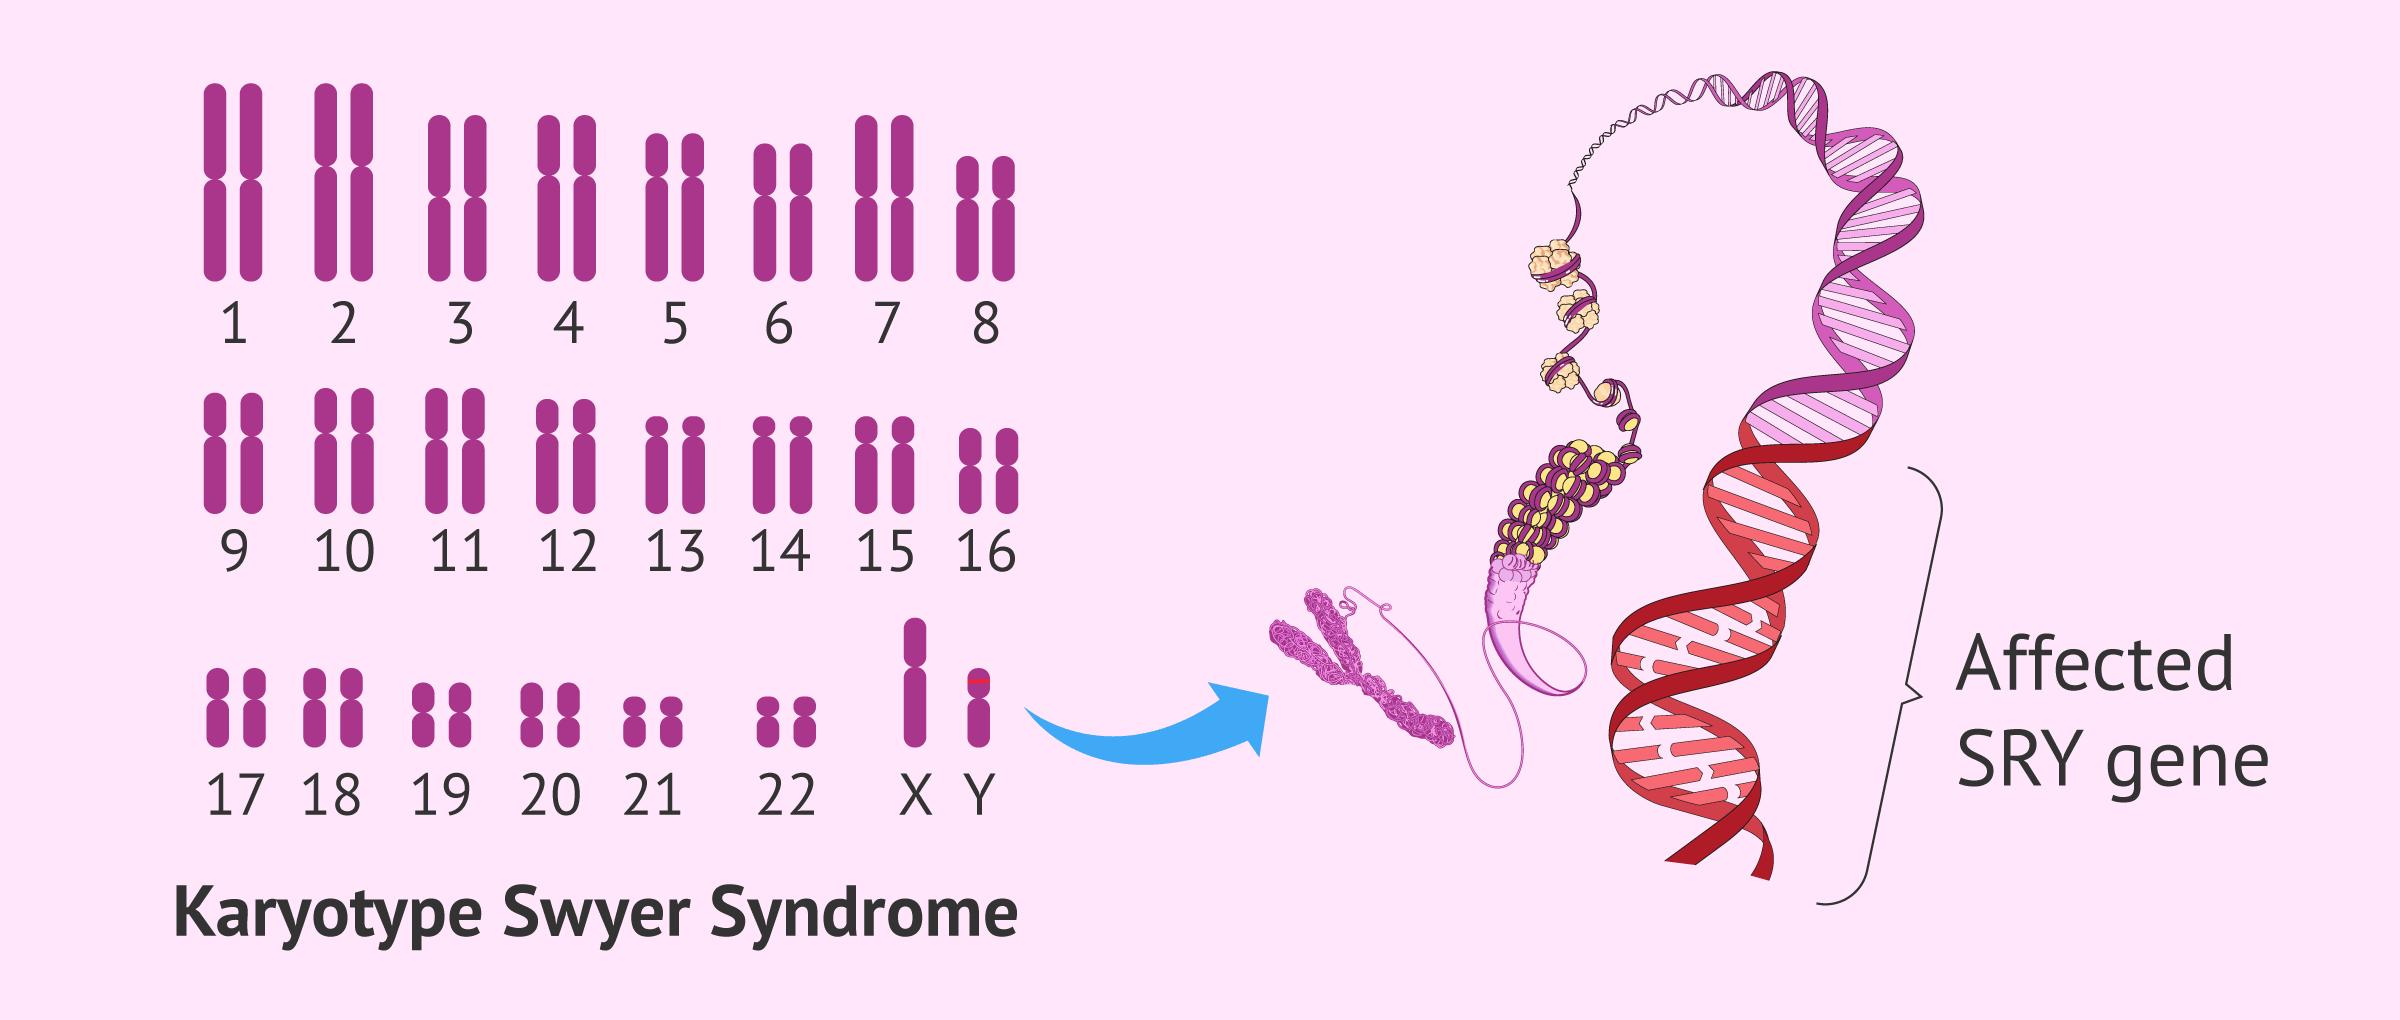 Imagen: Karyotype in Swyer syndrome